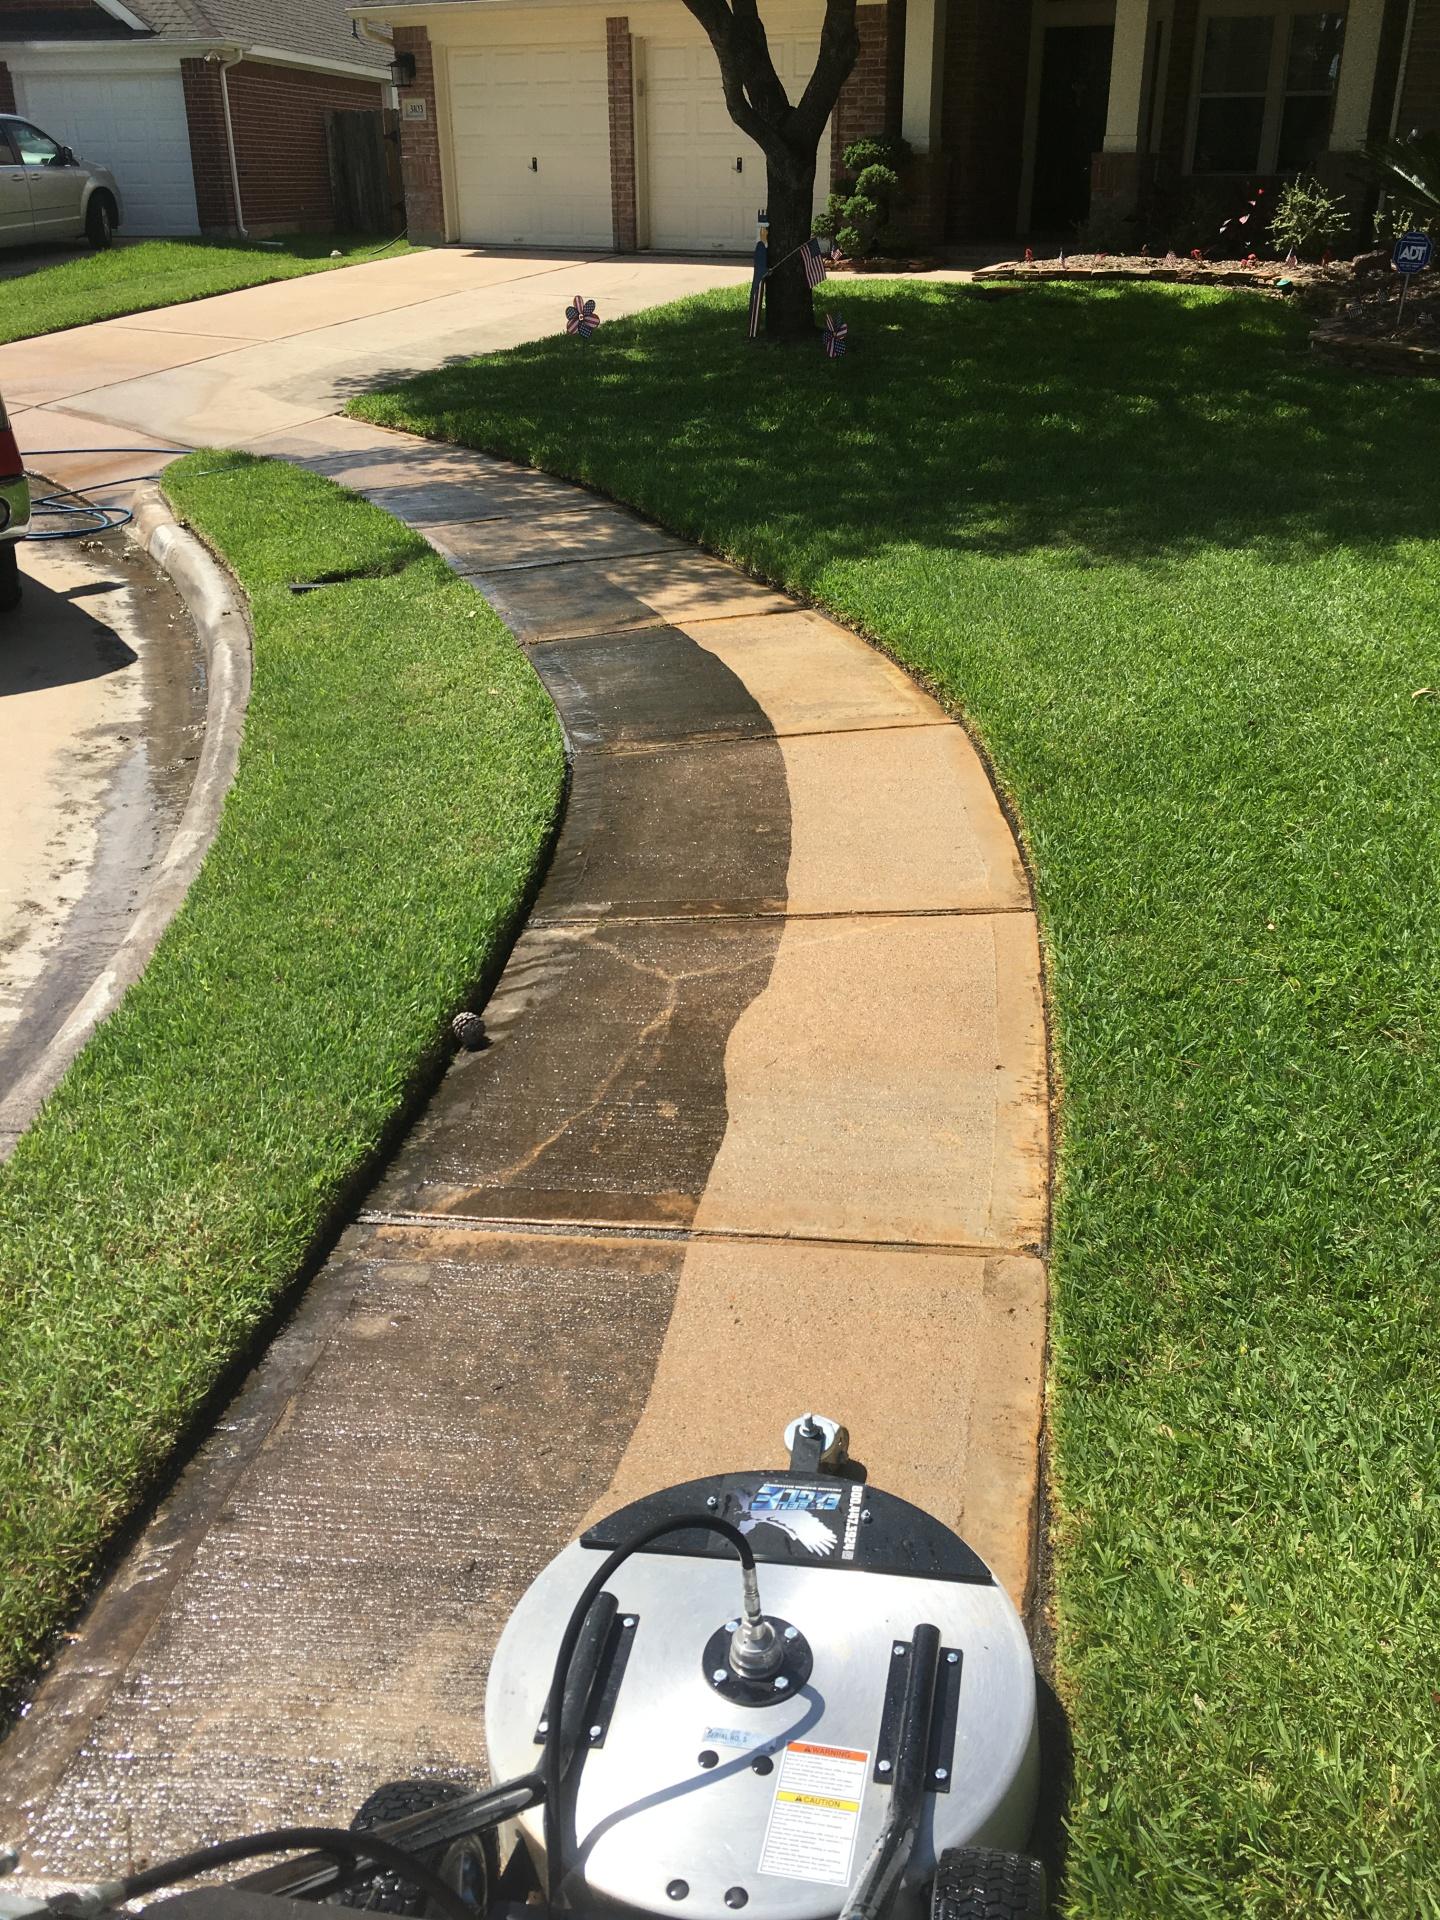 Sidewalk concrete pressure washing in pearland texas